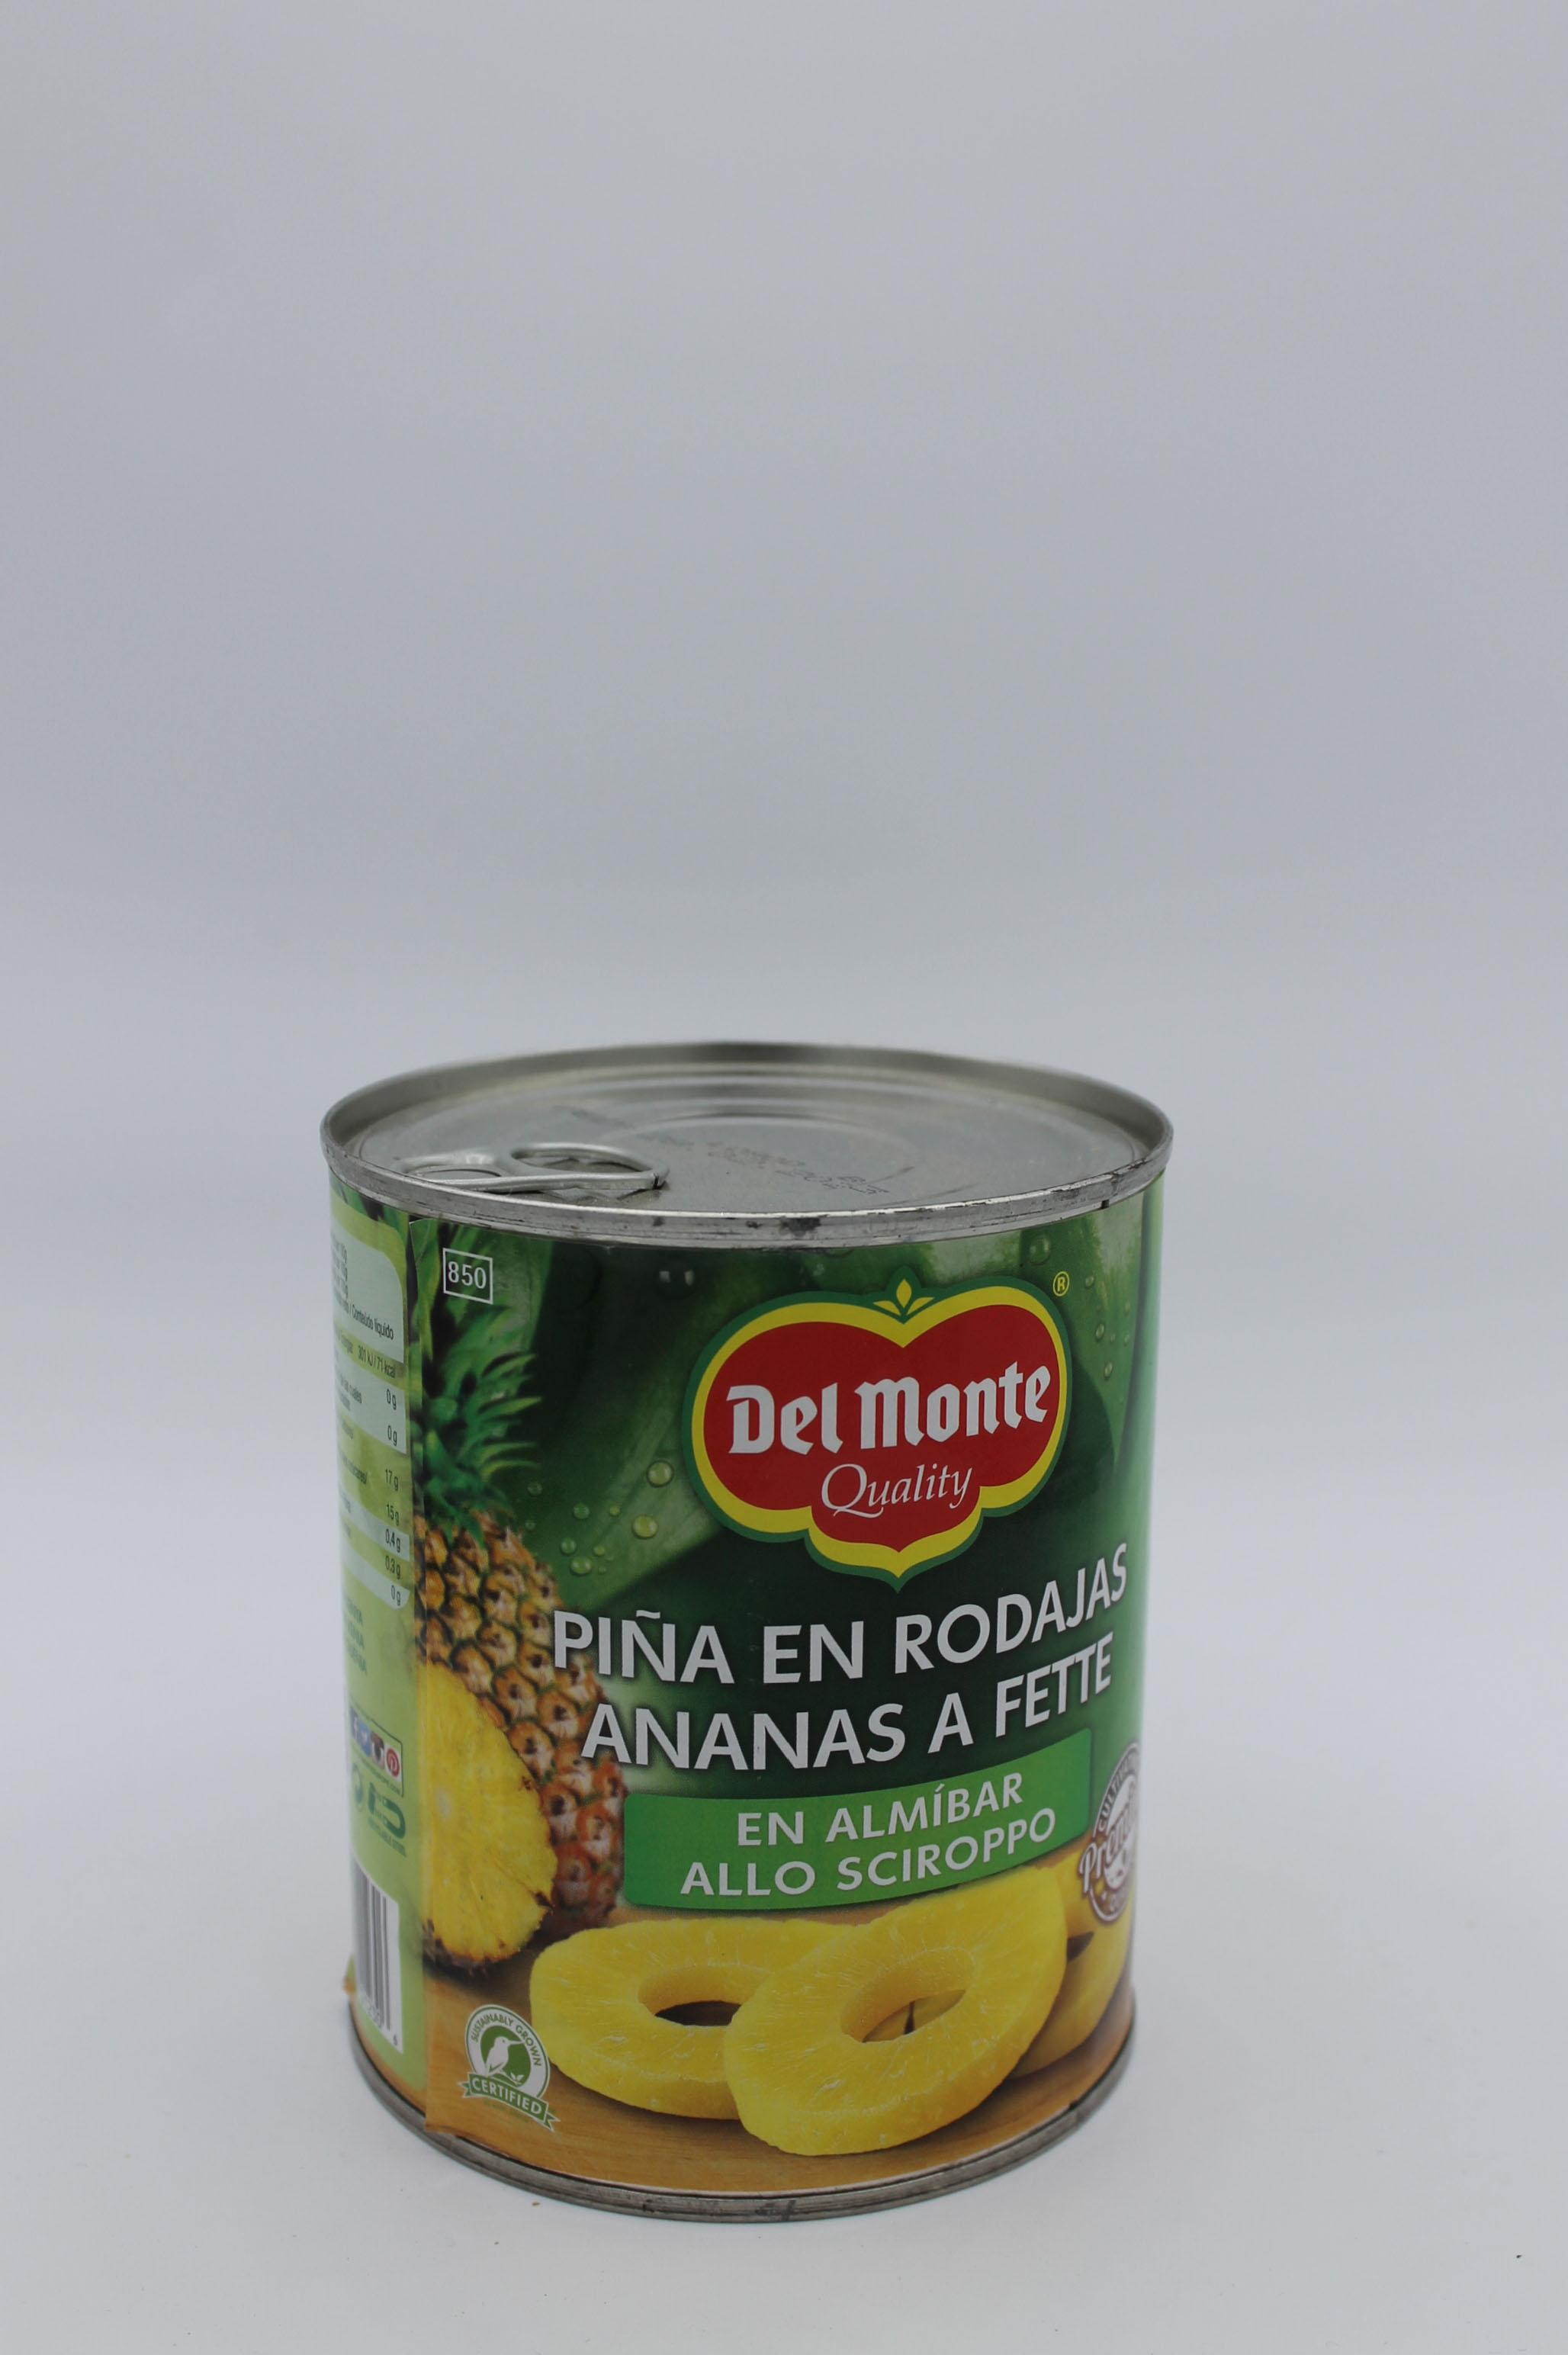 Del Monte ananas a fette 839gr.